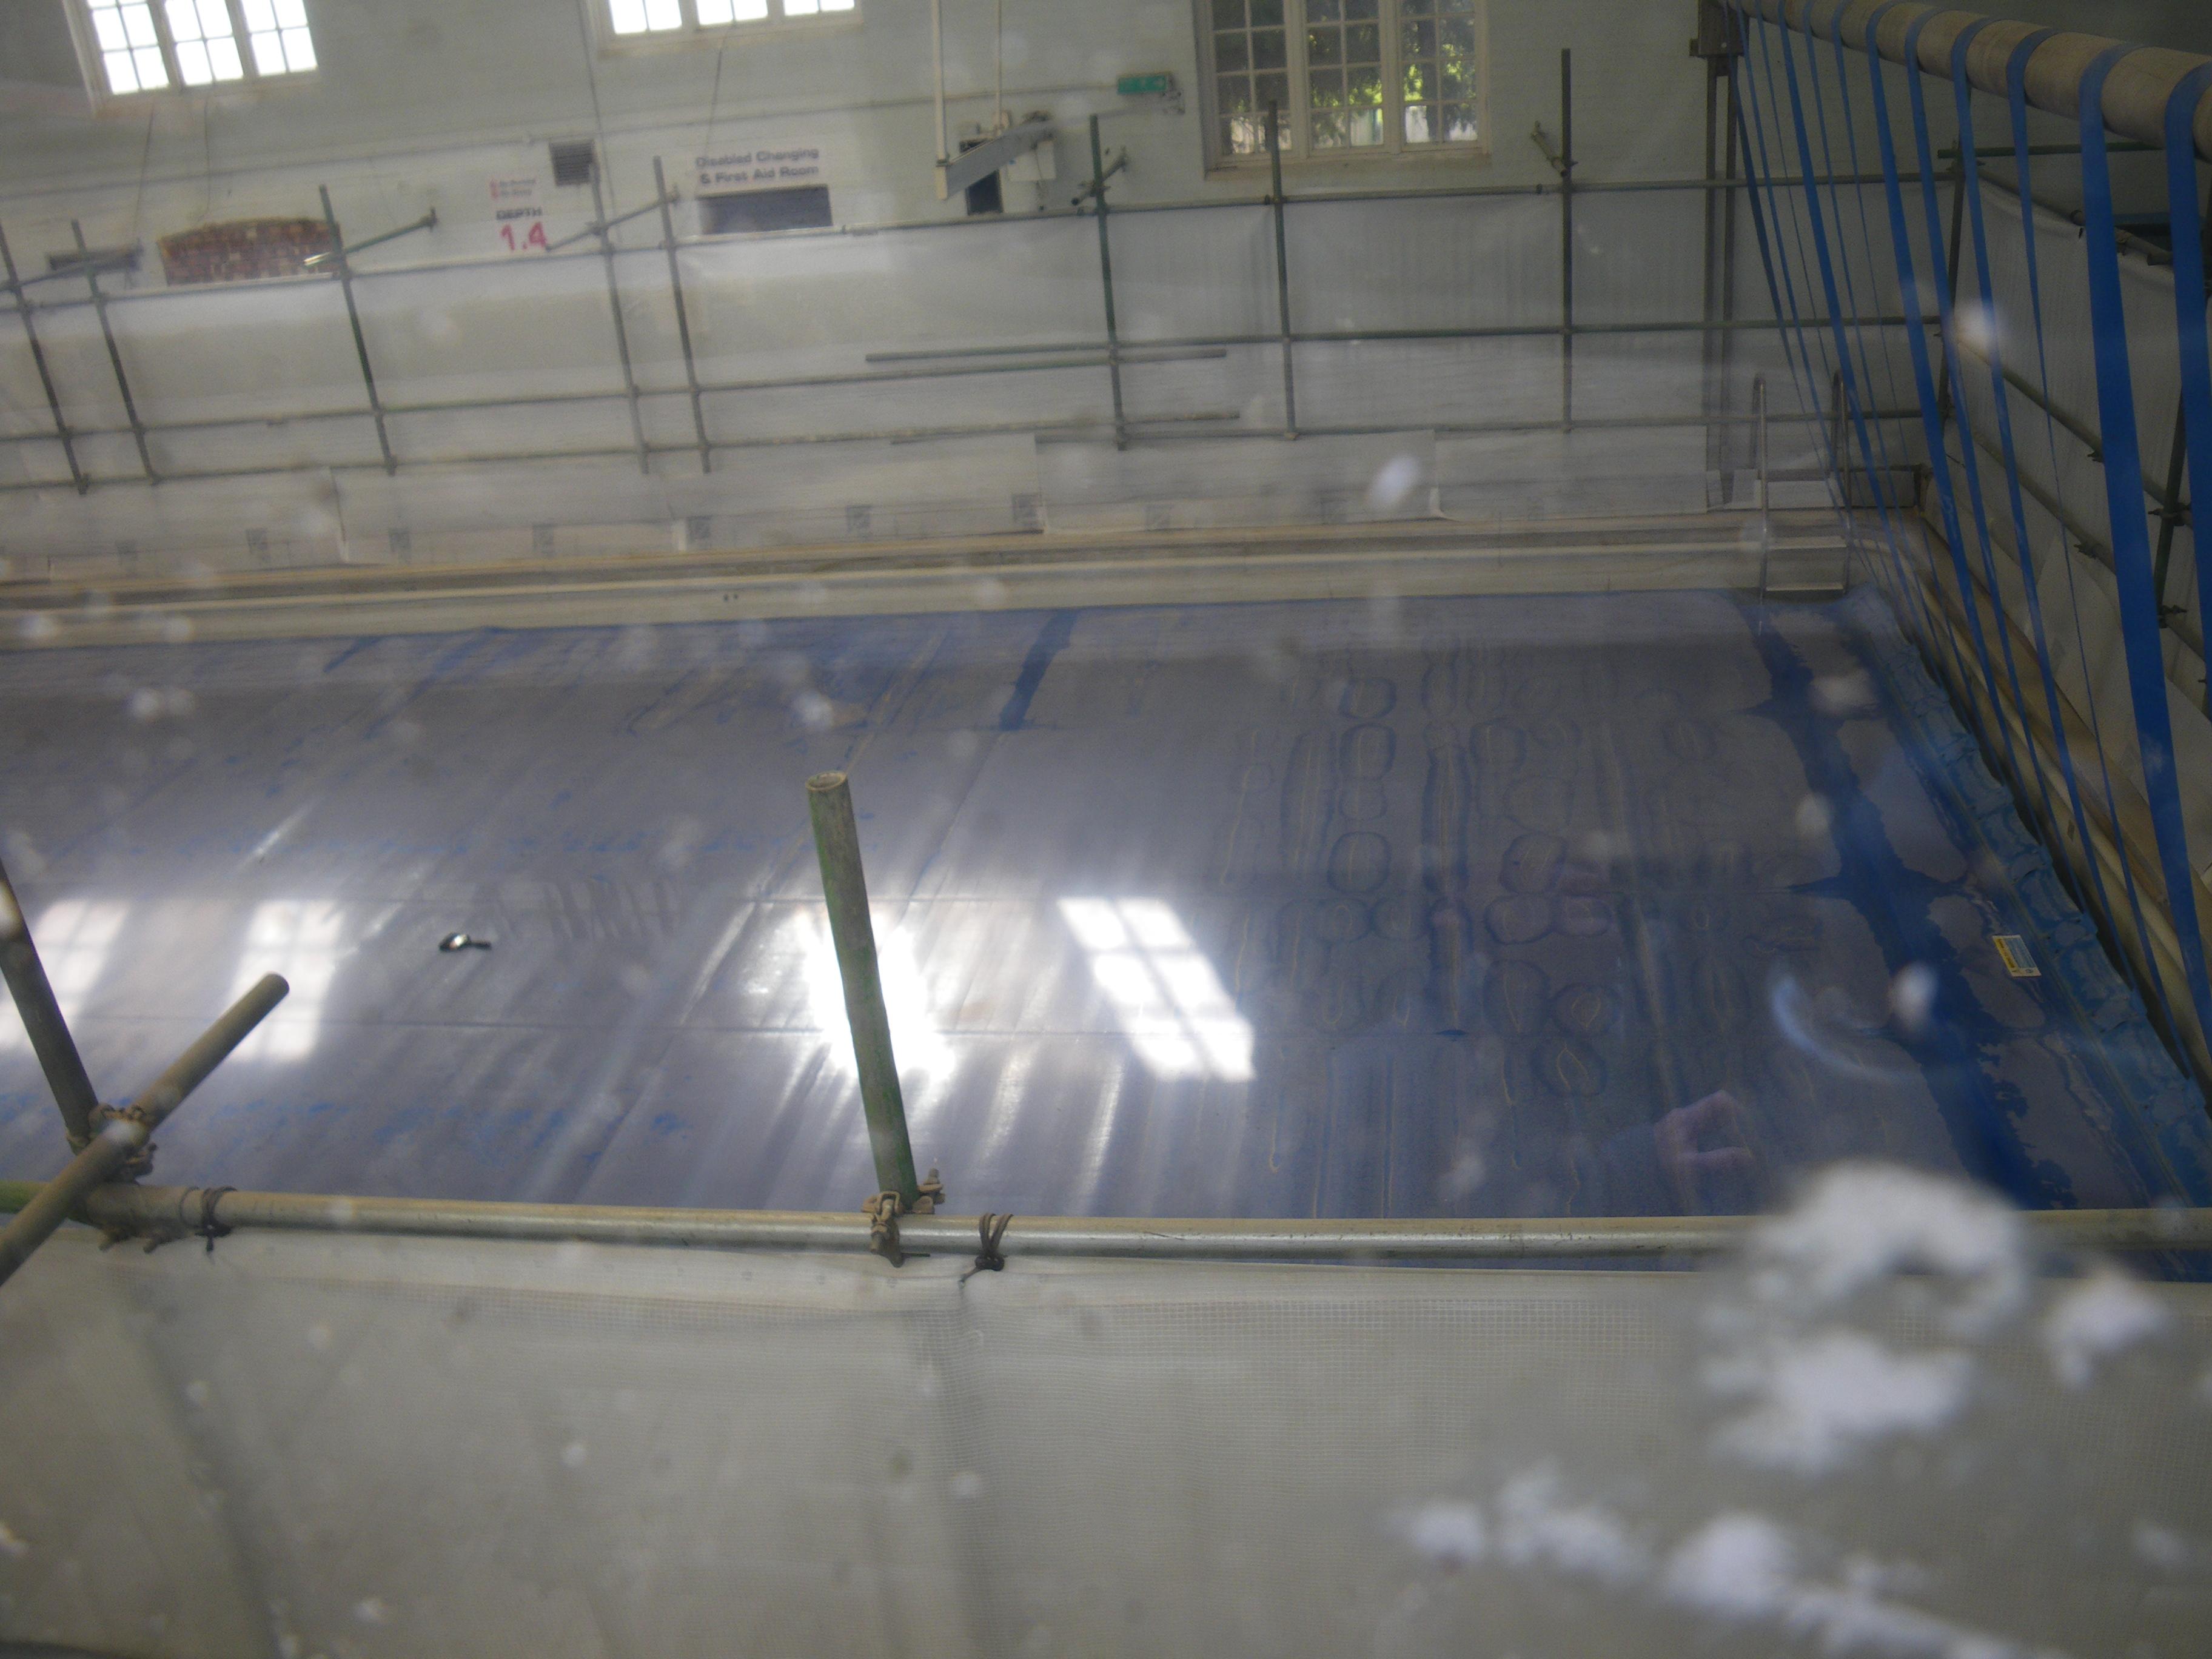 During the refurbishment